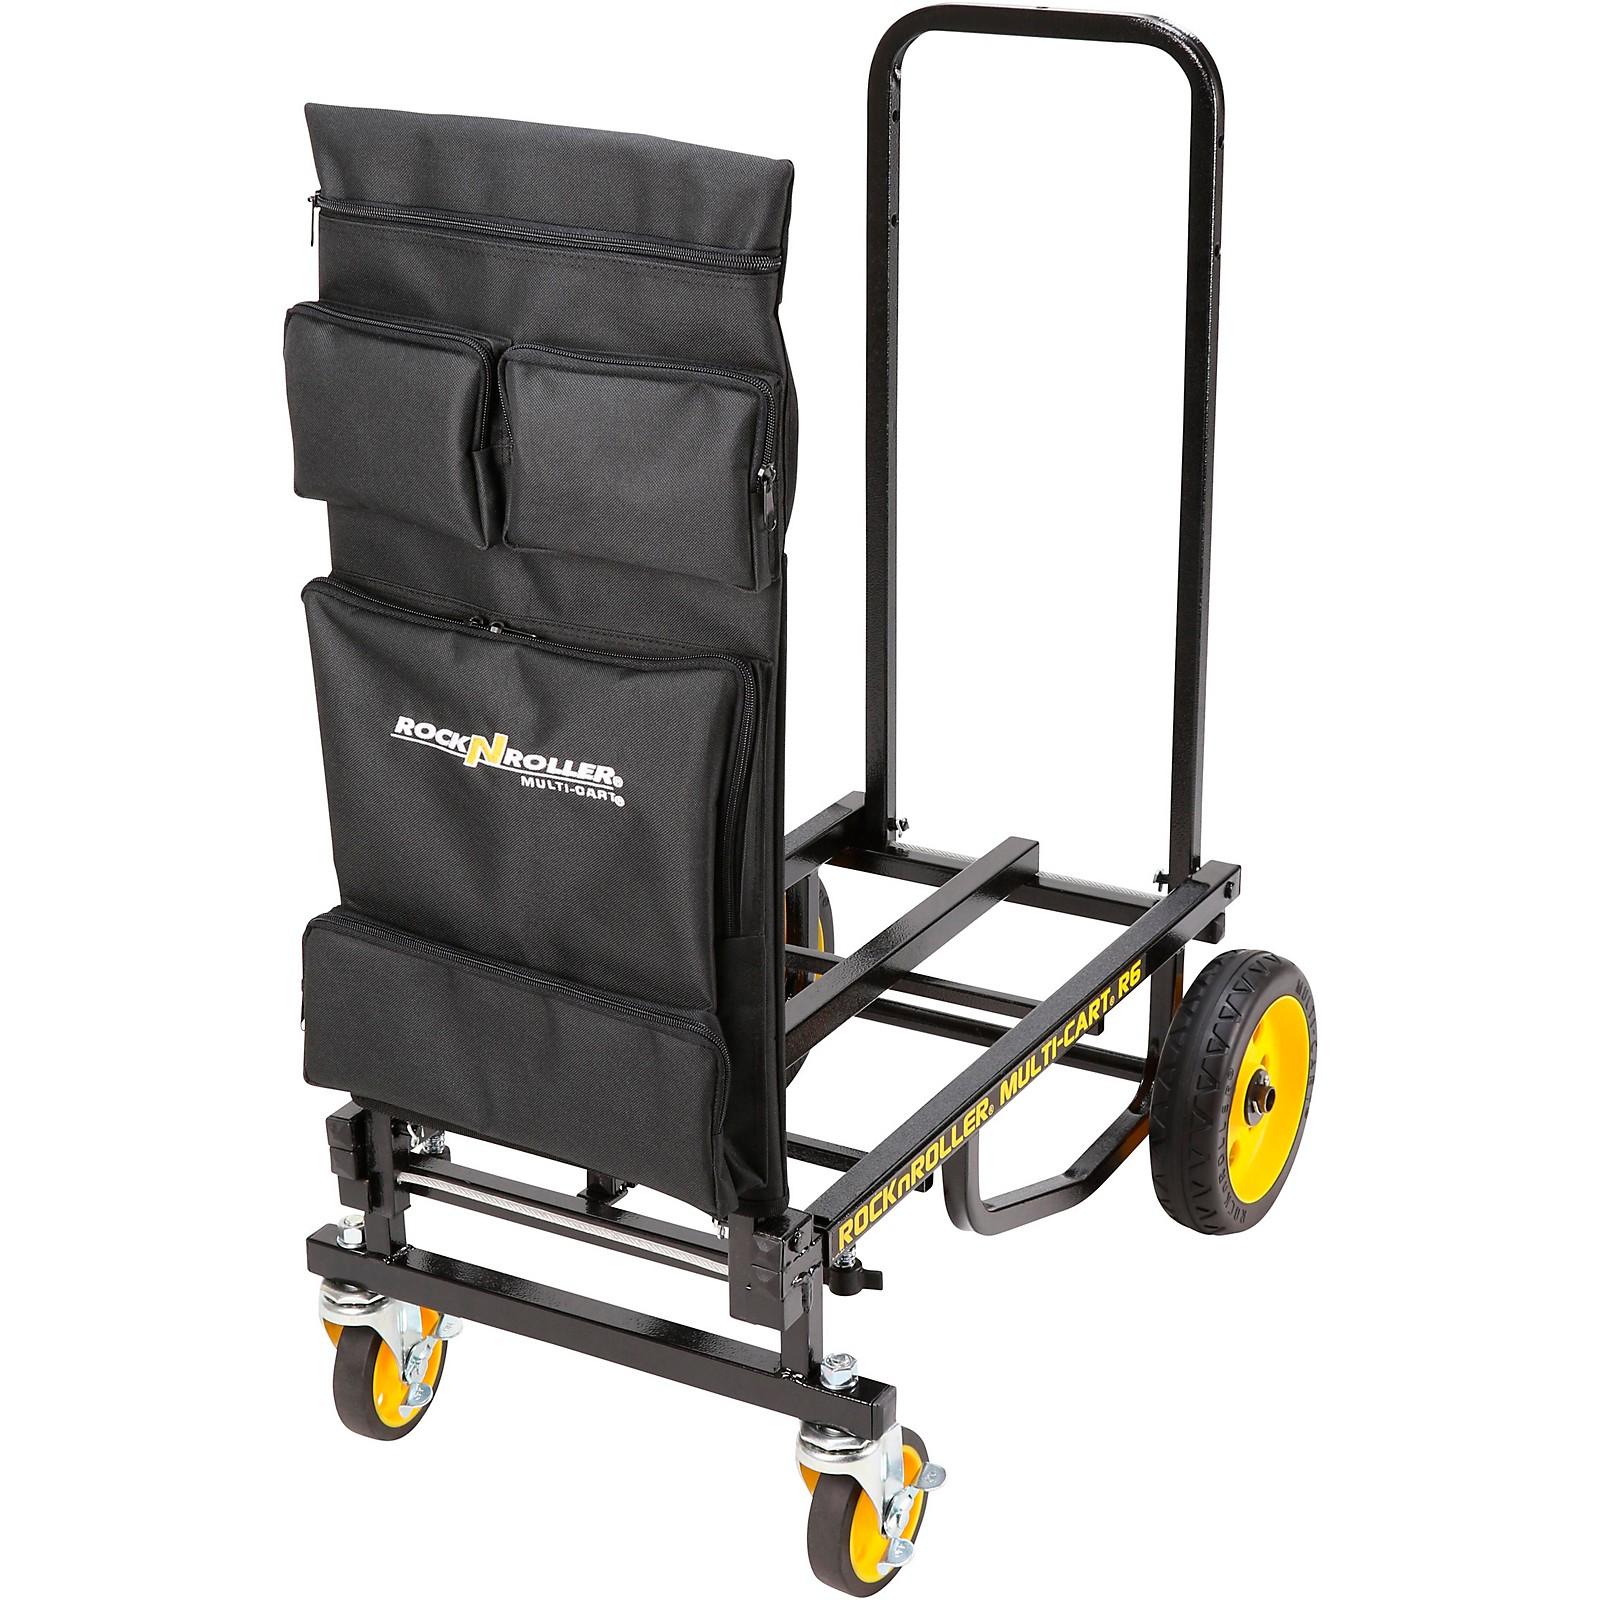 Rock N Roller RSA-TAB6 Small Multi-Pocket Tool/Accessory Bag (Fits R2, R6 Carts)